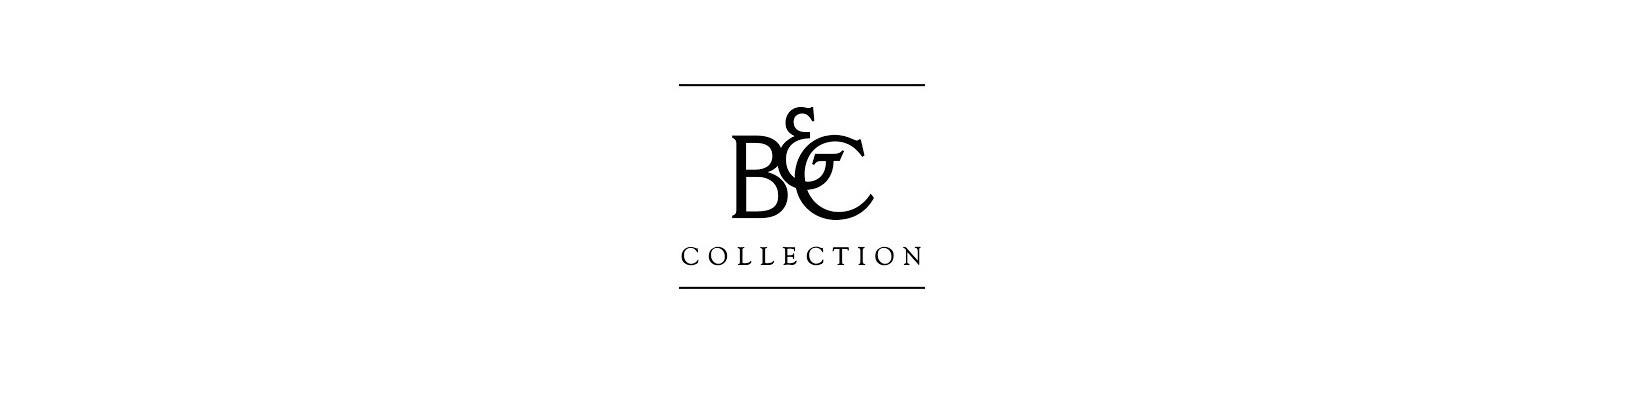 Vêtements B&C Collection | Mes Tenues Perso